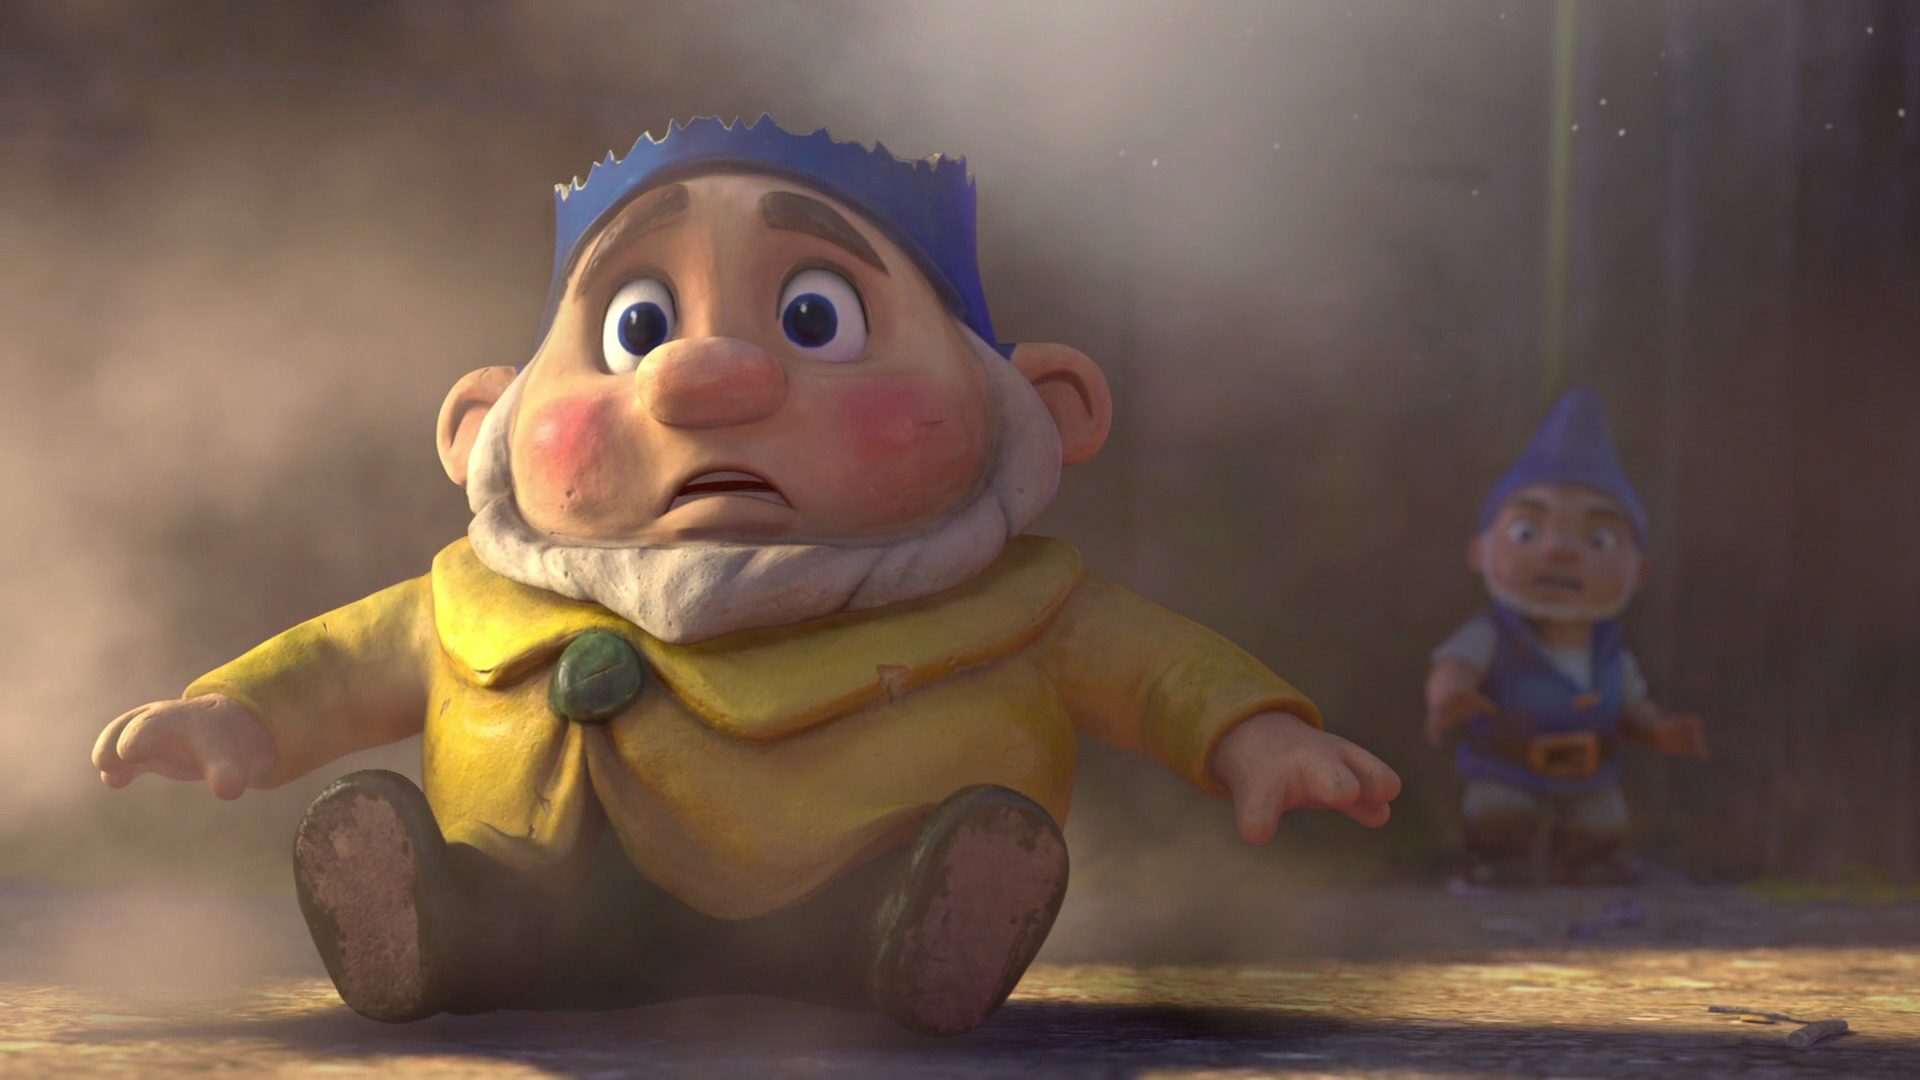 image gnomeo juliet disneyscreencaps com 6002 jpg disney wiki